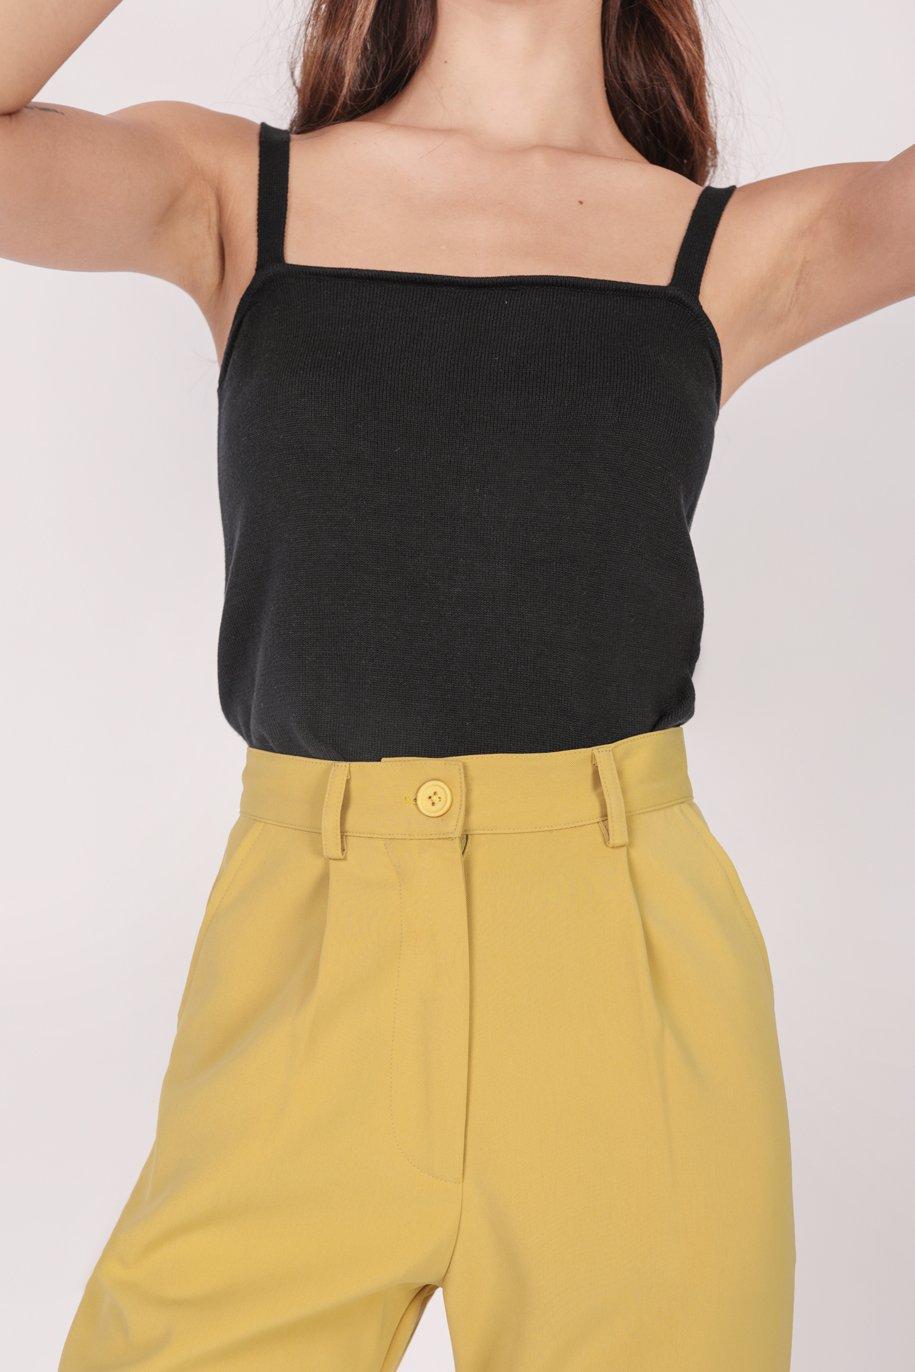 Clan Straight Leg Culottes (Honey)